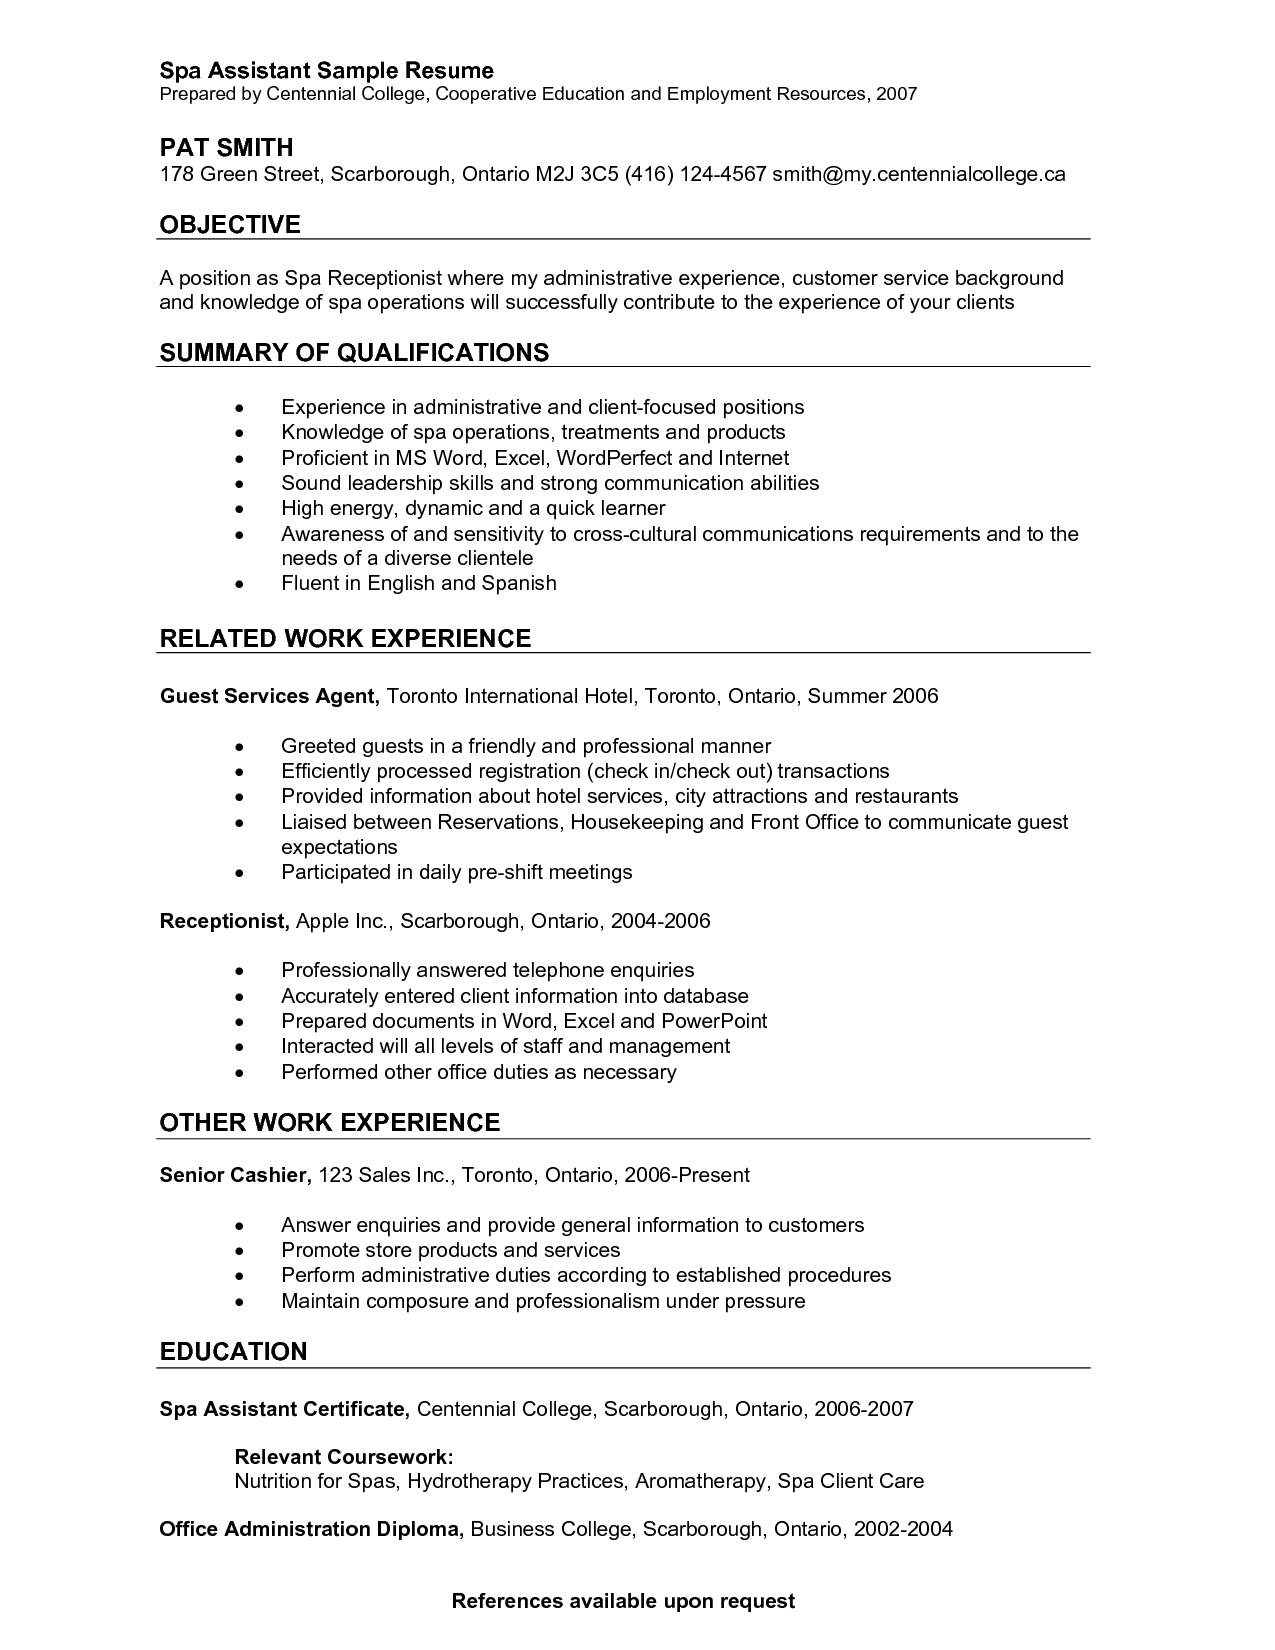 Medical Receptionist Resume Objective Samples  resume